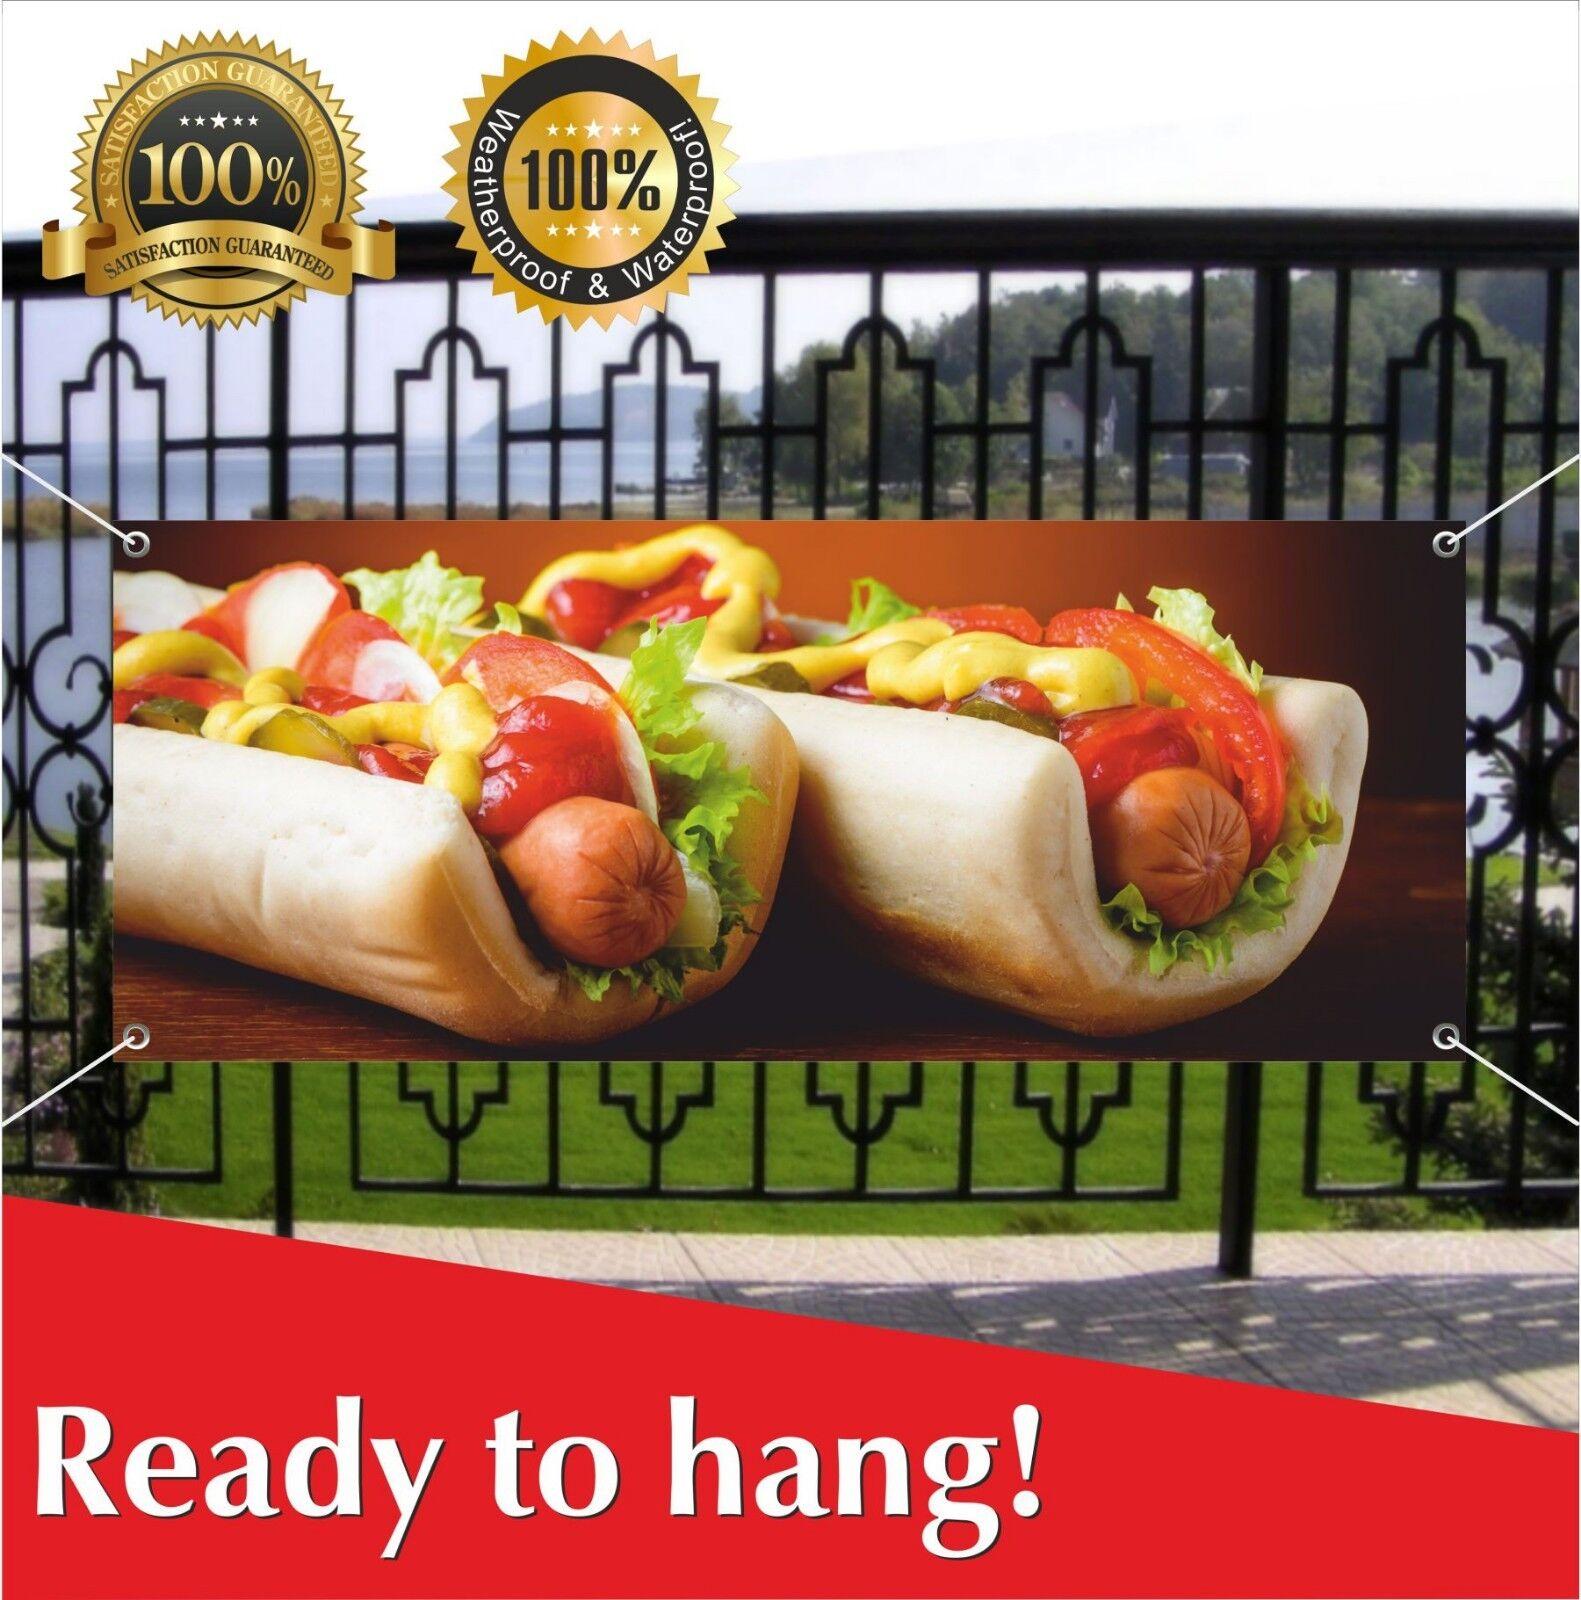 HOT DOGS Banner Vinyl / Mesh Banner Sign Flag Fast Food Cafe Bar Burgers Hotdogs - $17.76